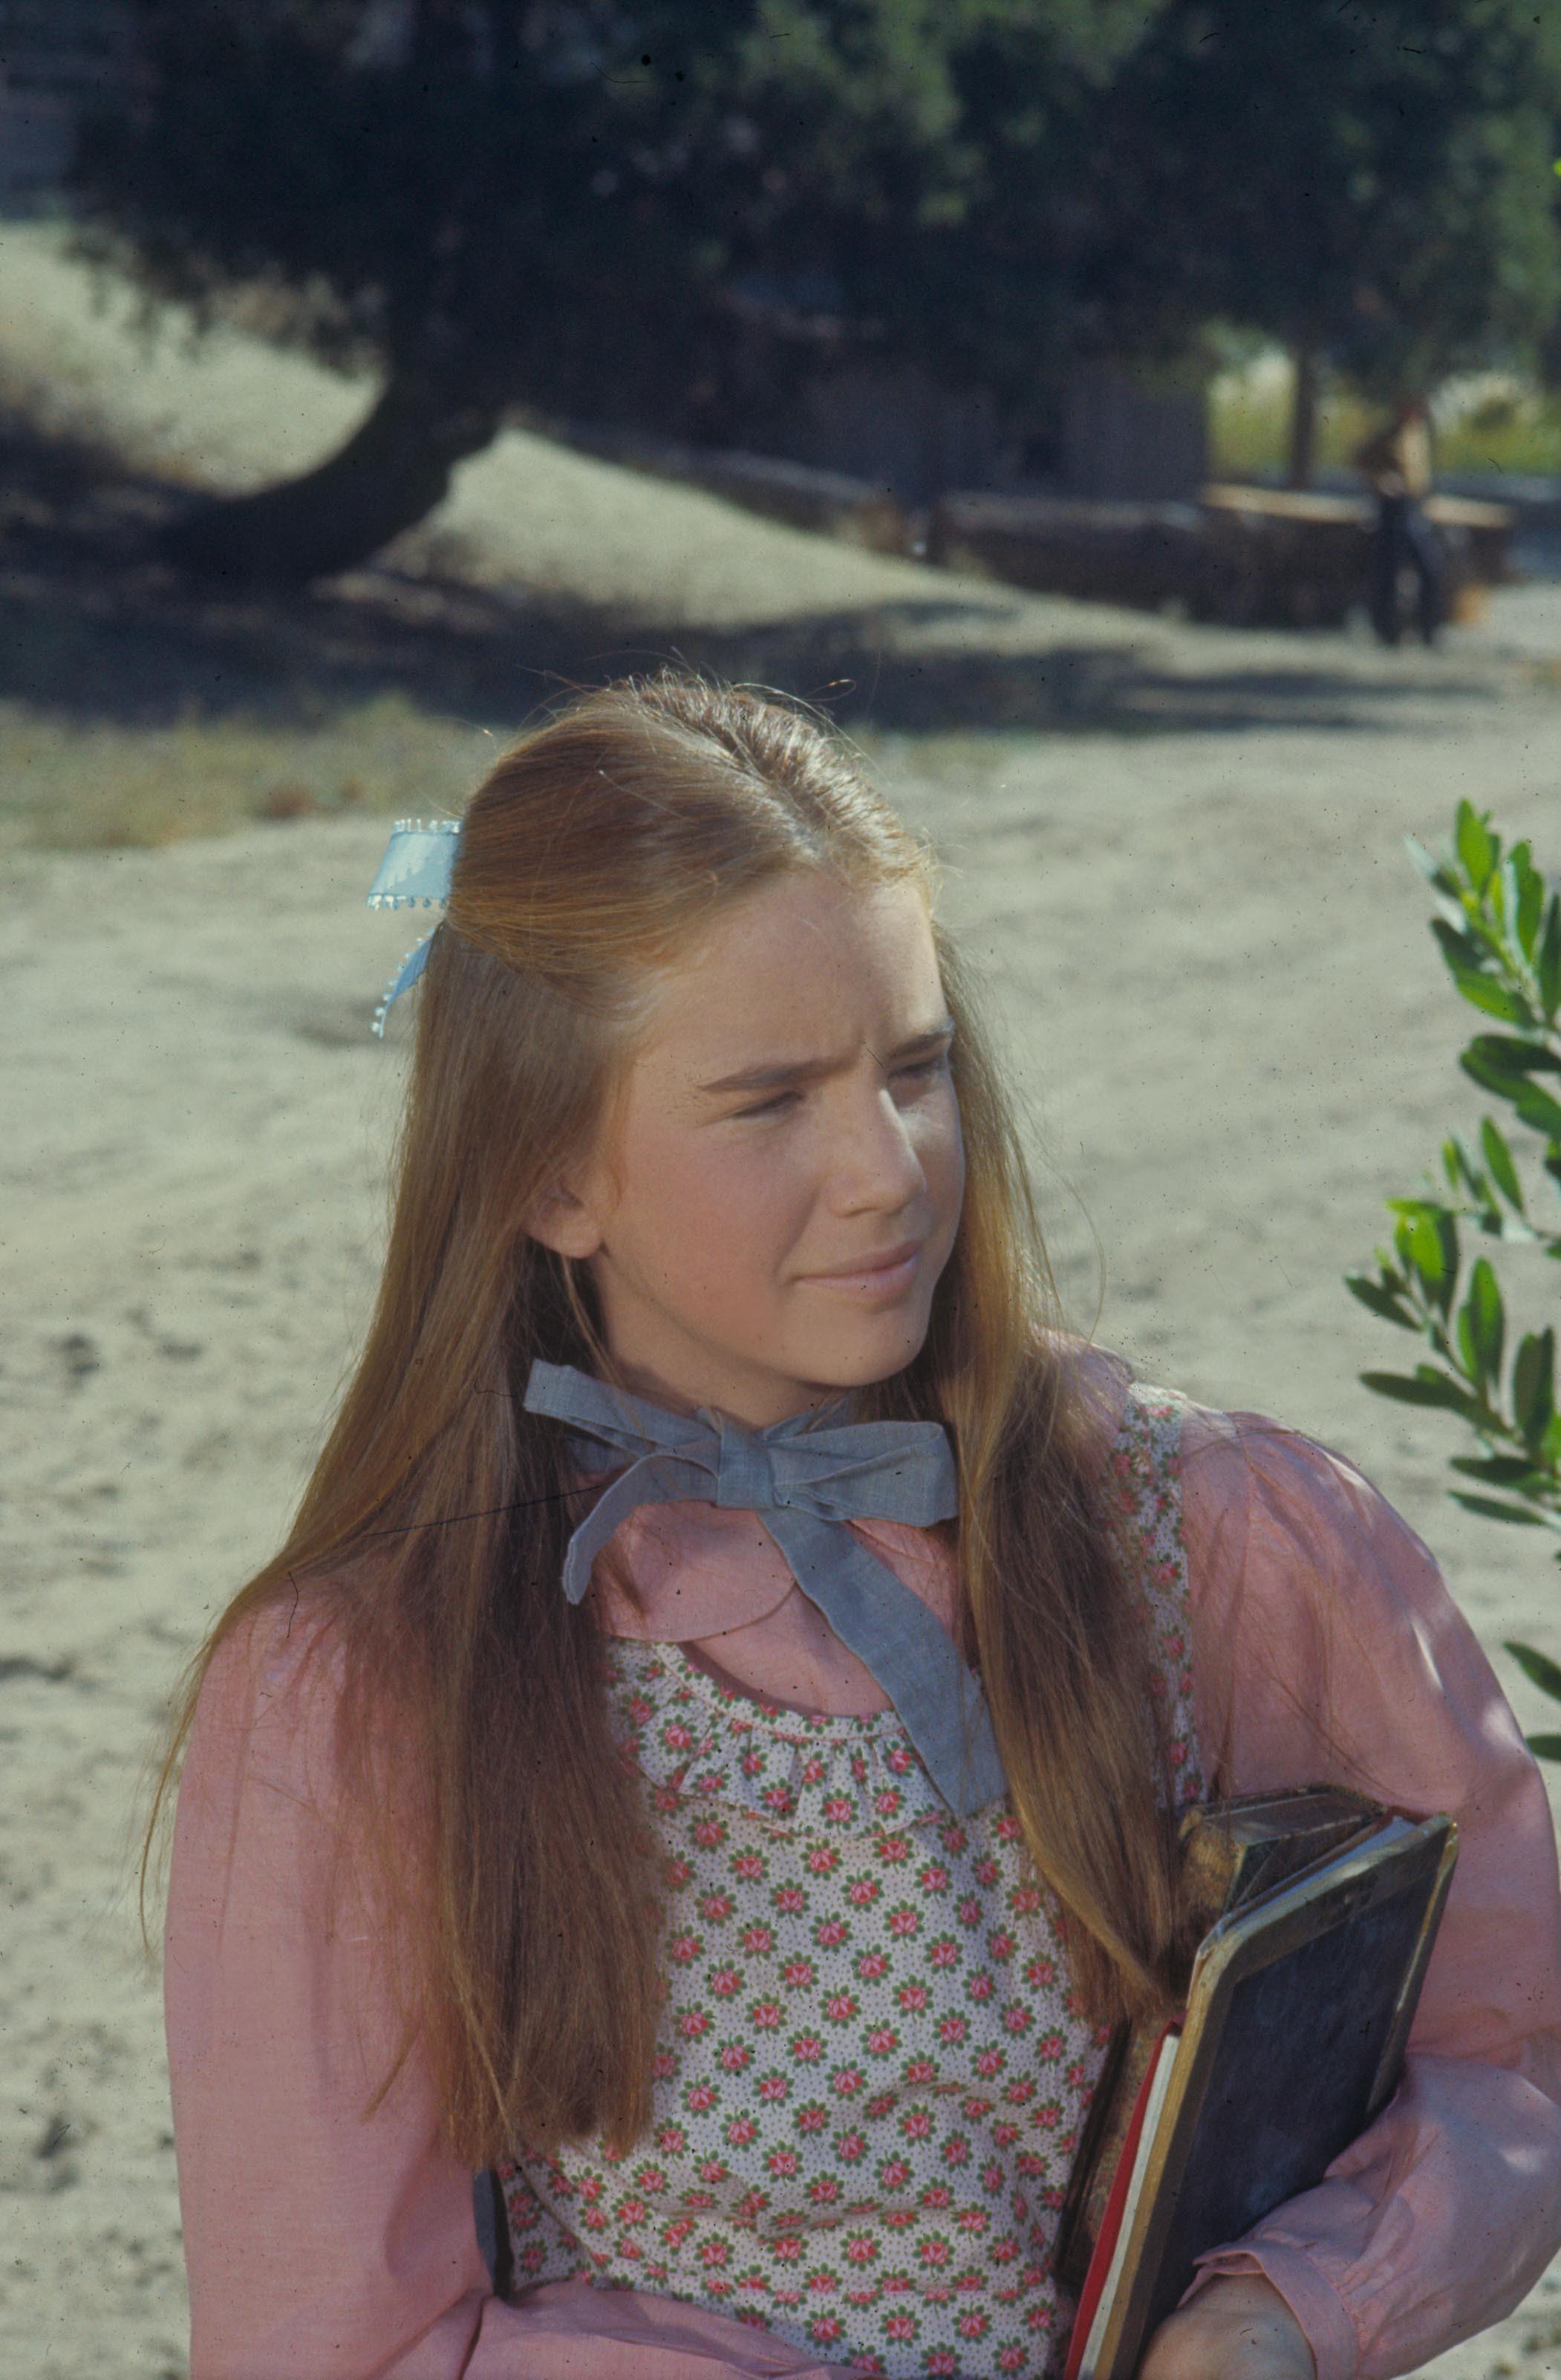 Melissa Gilbert on Little House on the Prairie - Child ... | 524 x 800 jpeg 45kB